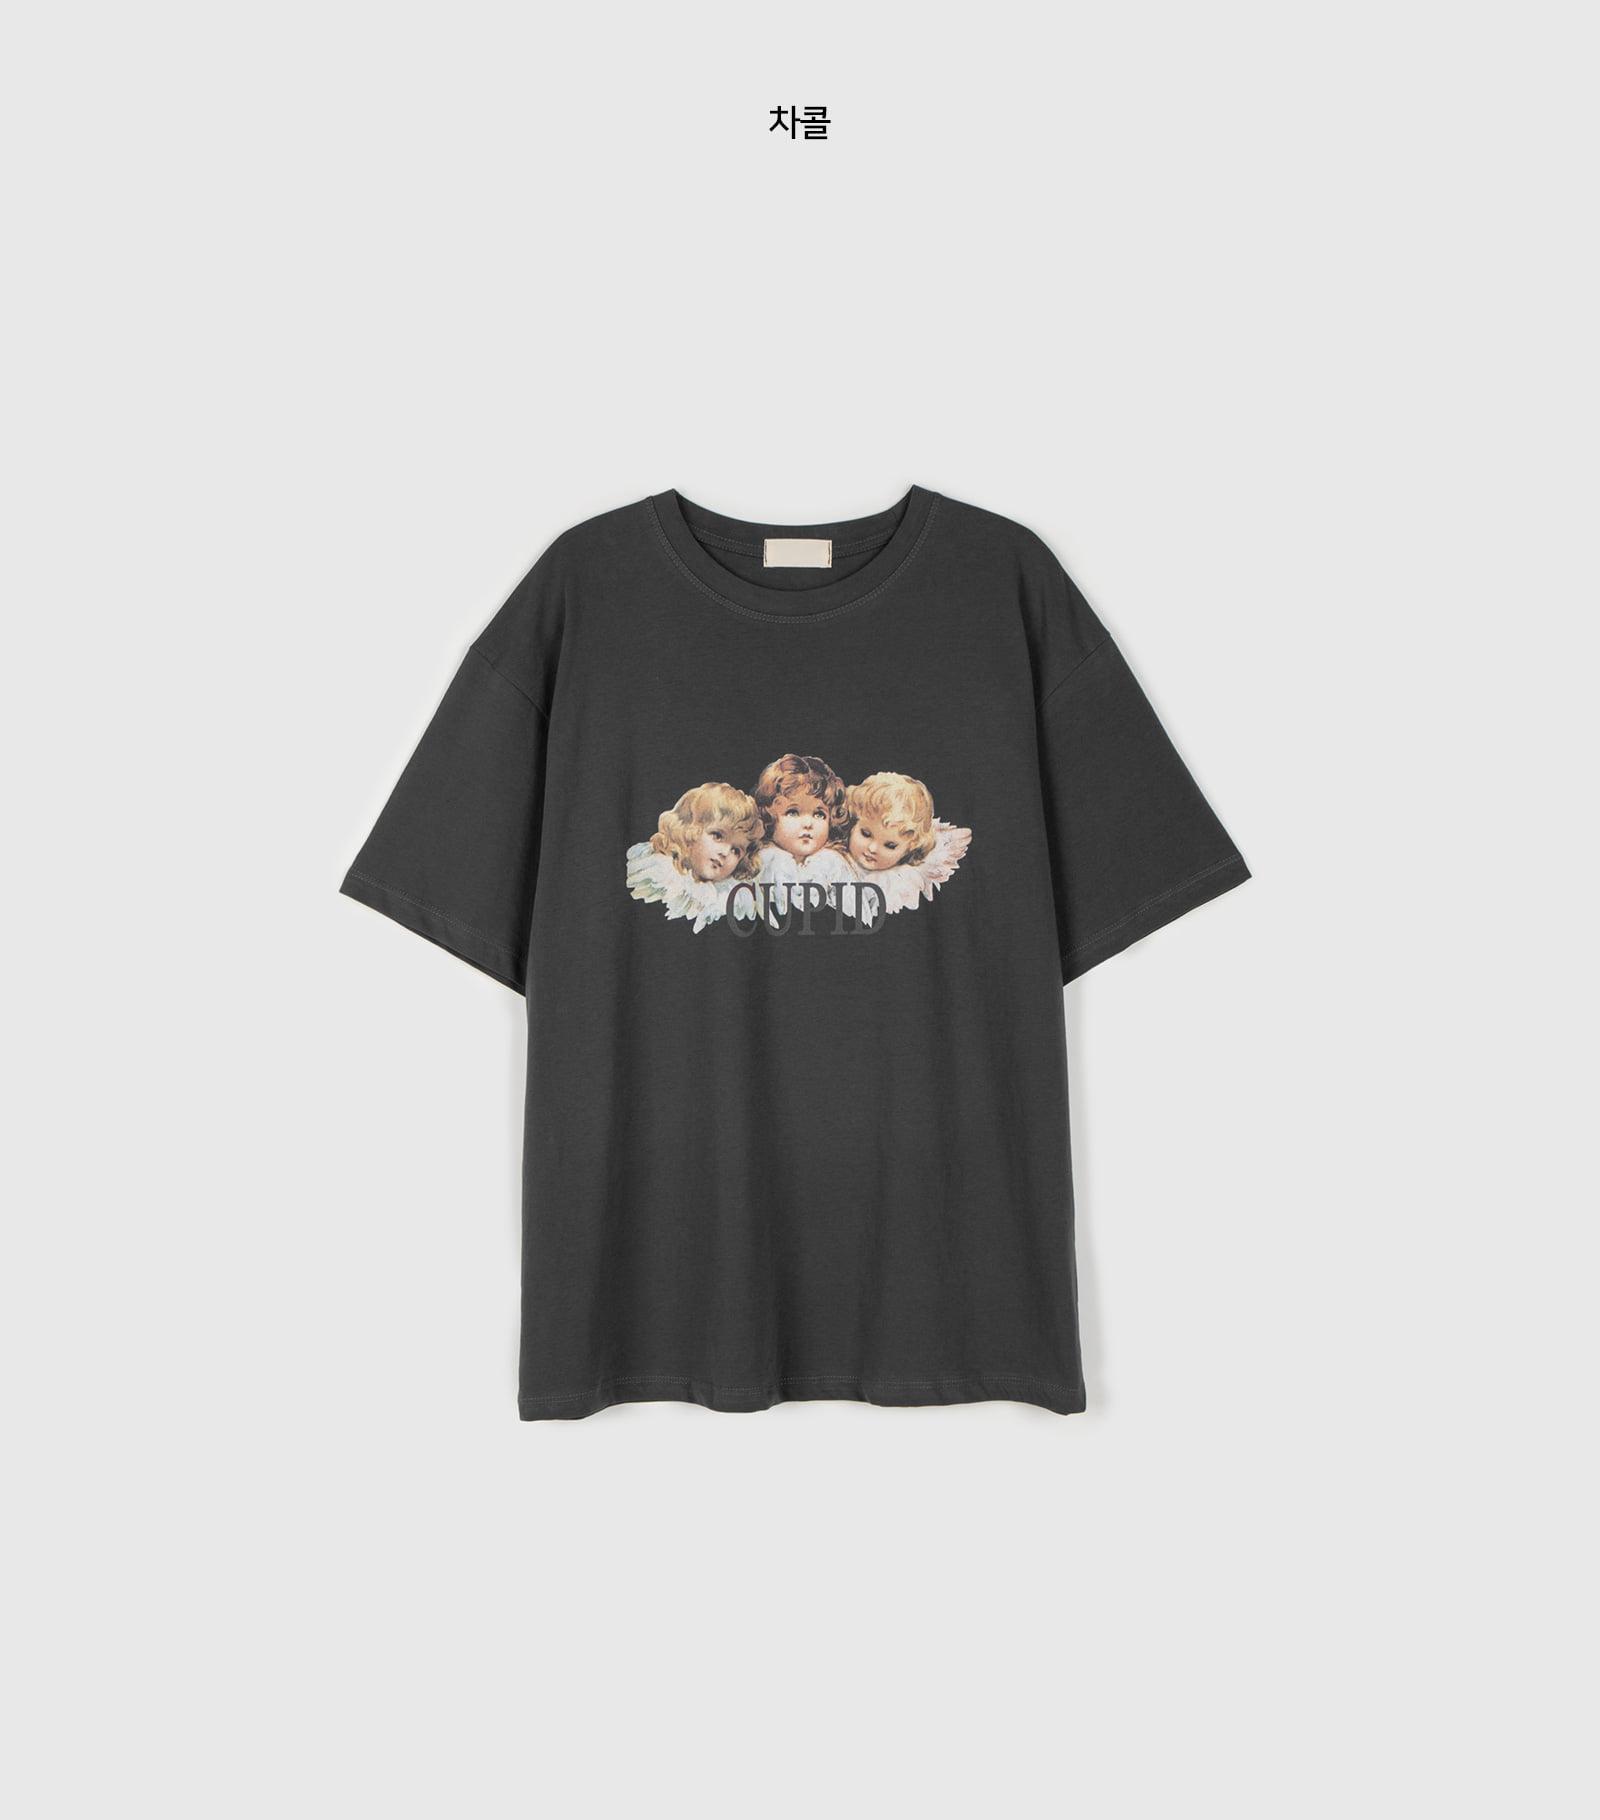 Cupid printed half round neck T-shirt